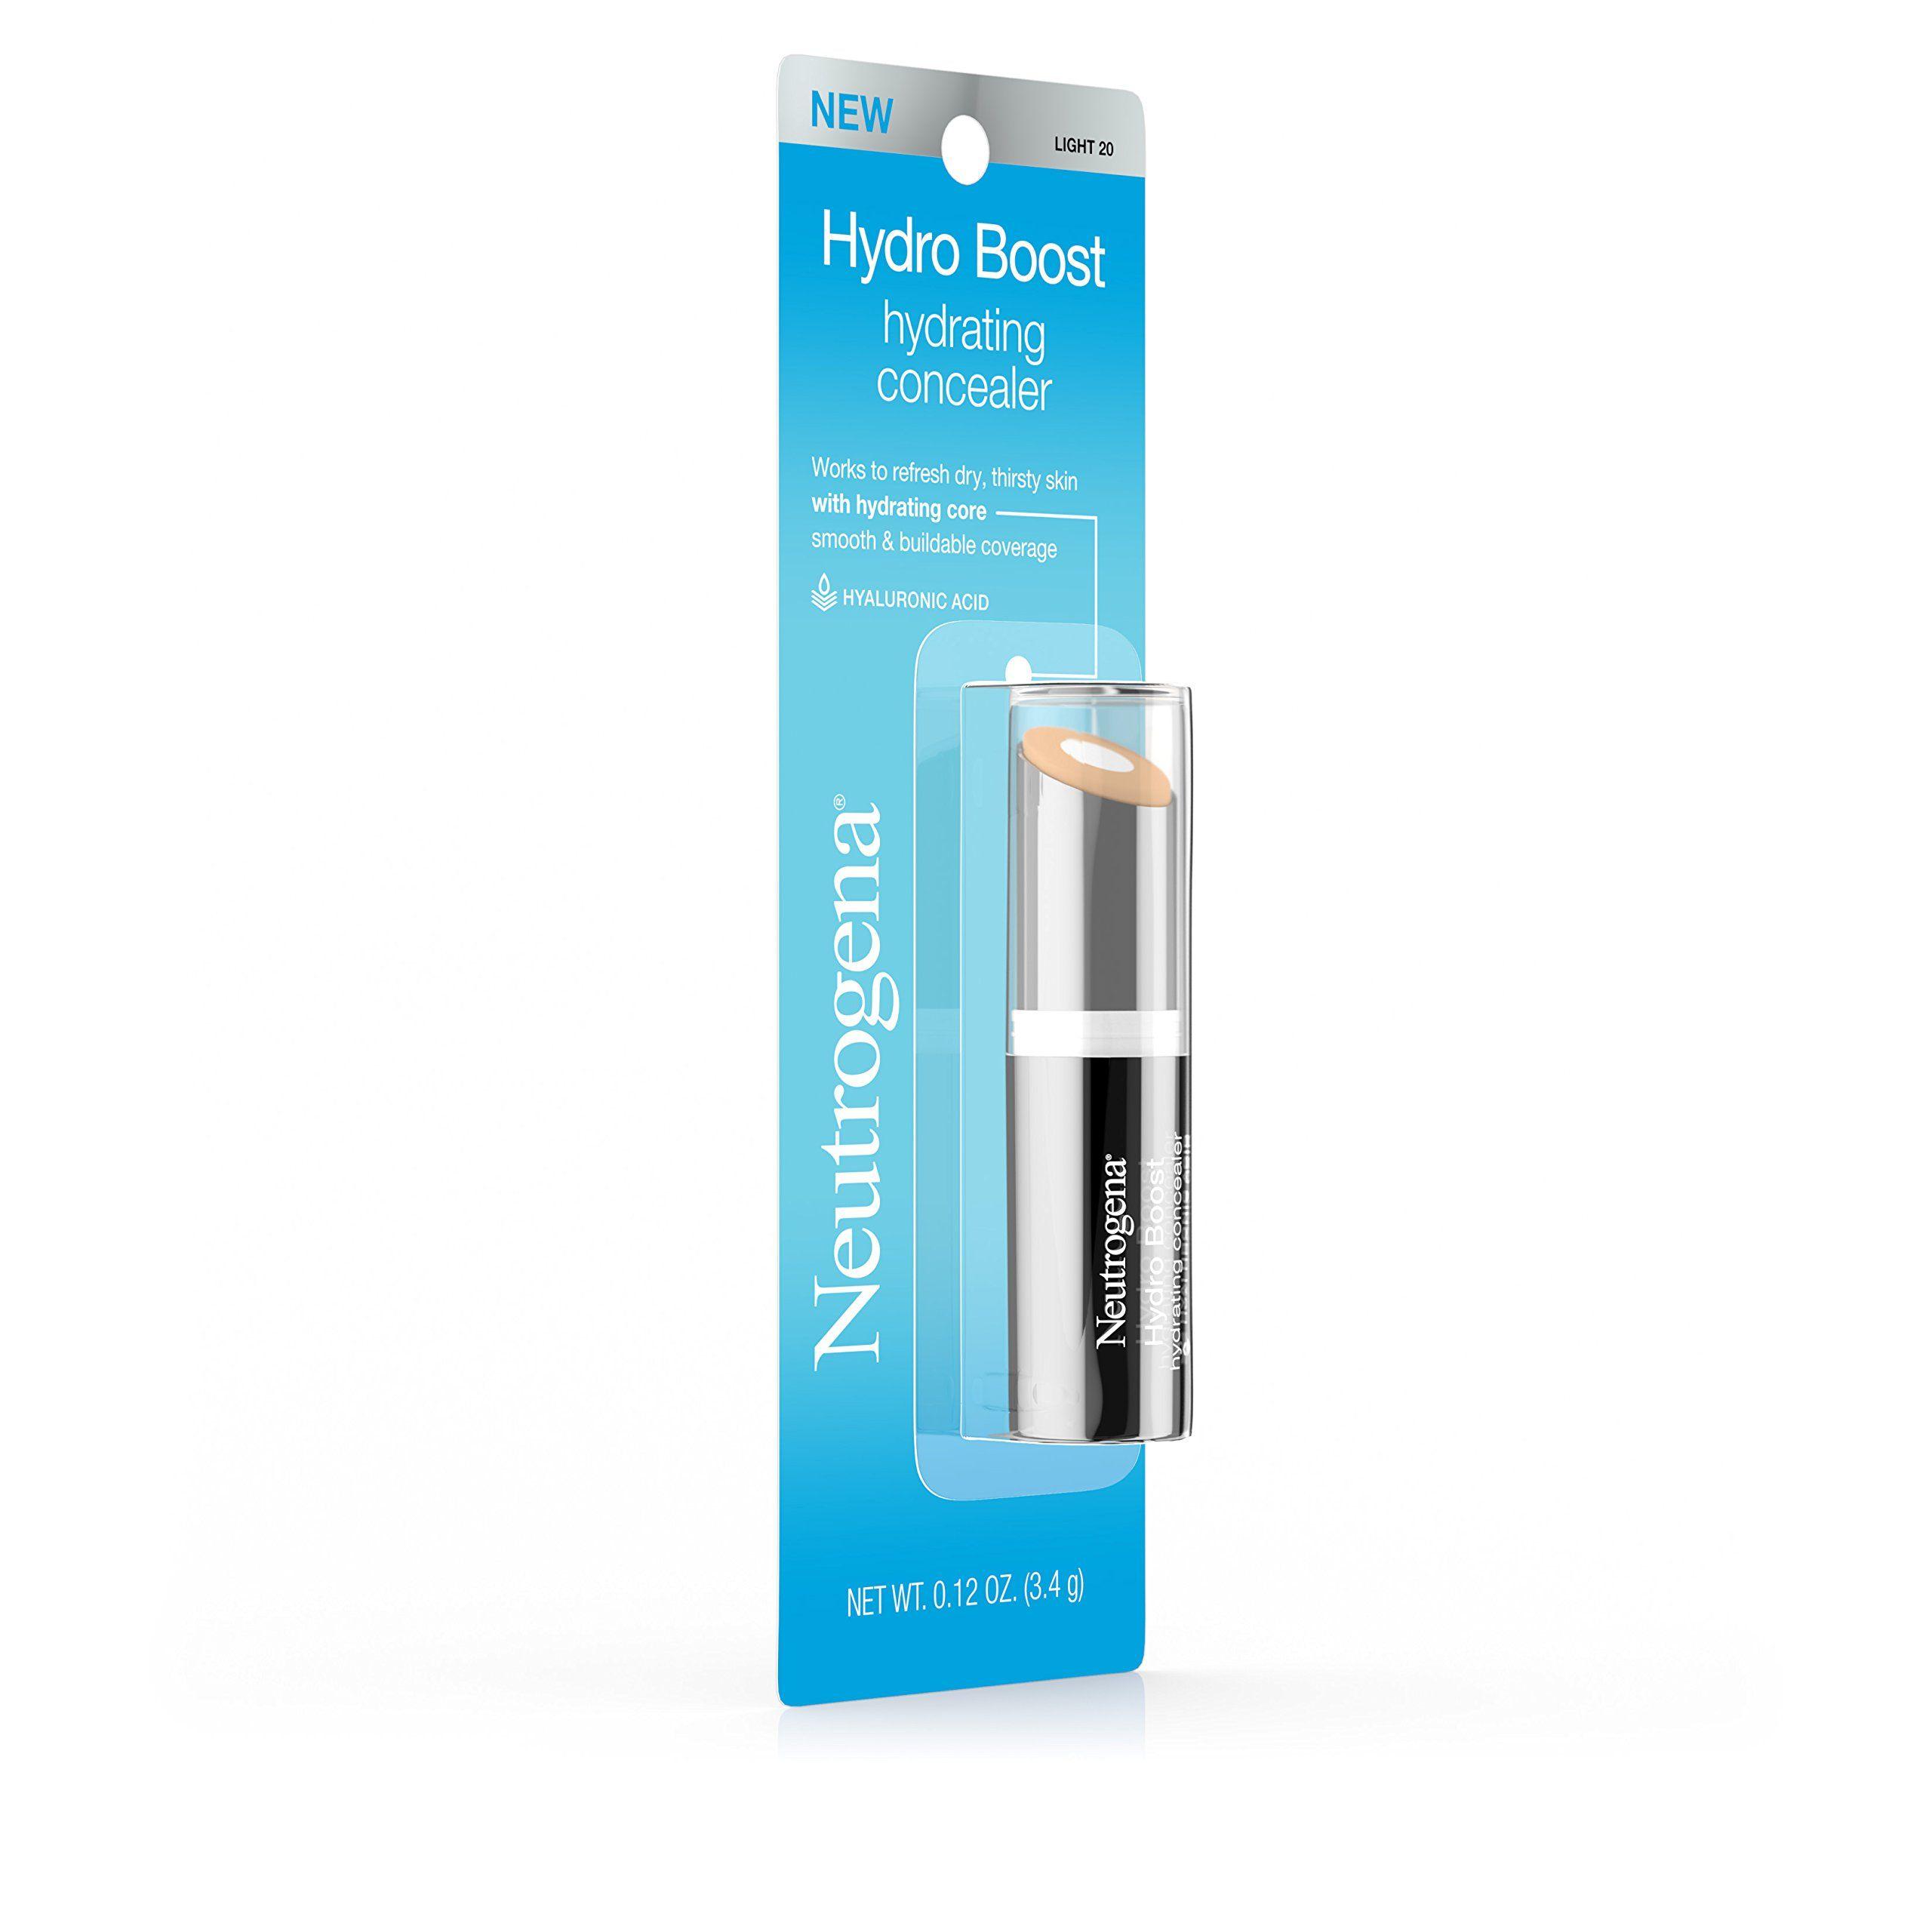 Neutrogena Hydro Boost Hydrating Concealer 20 Light 0.12